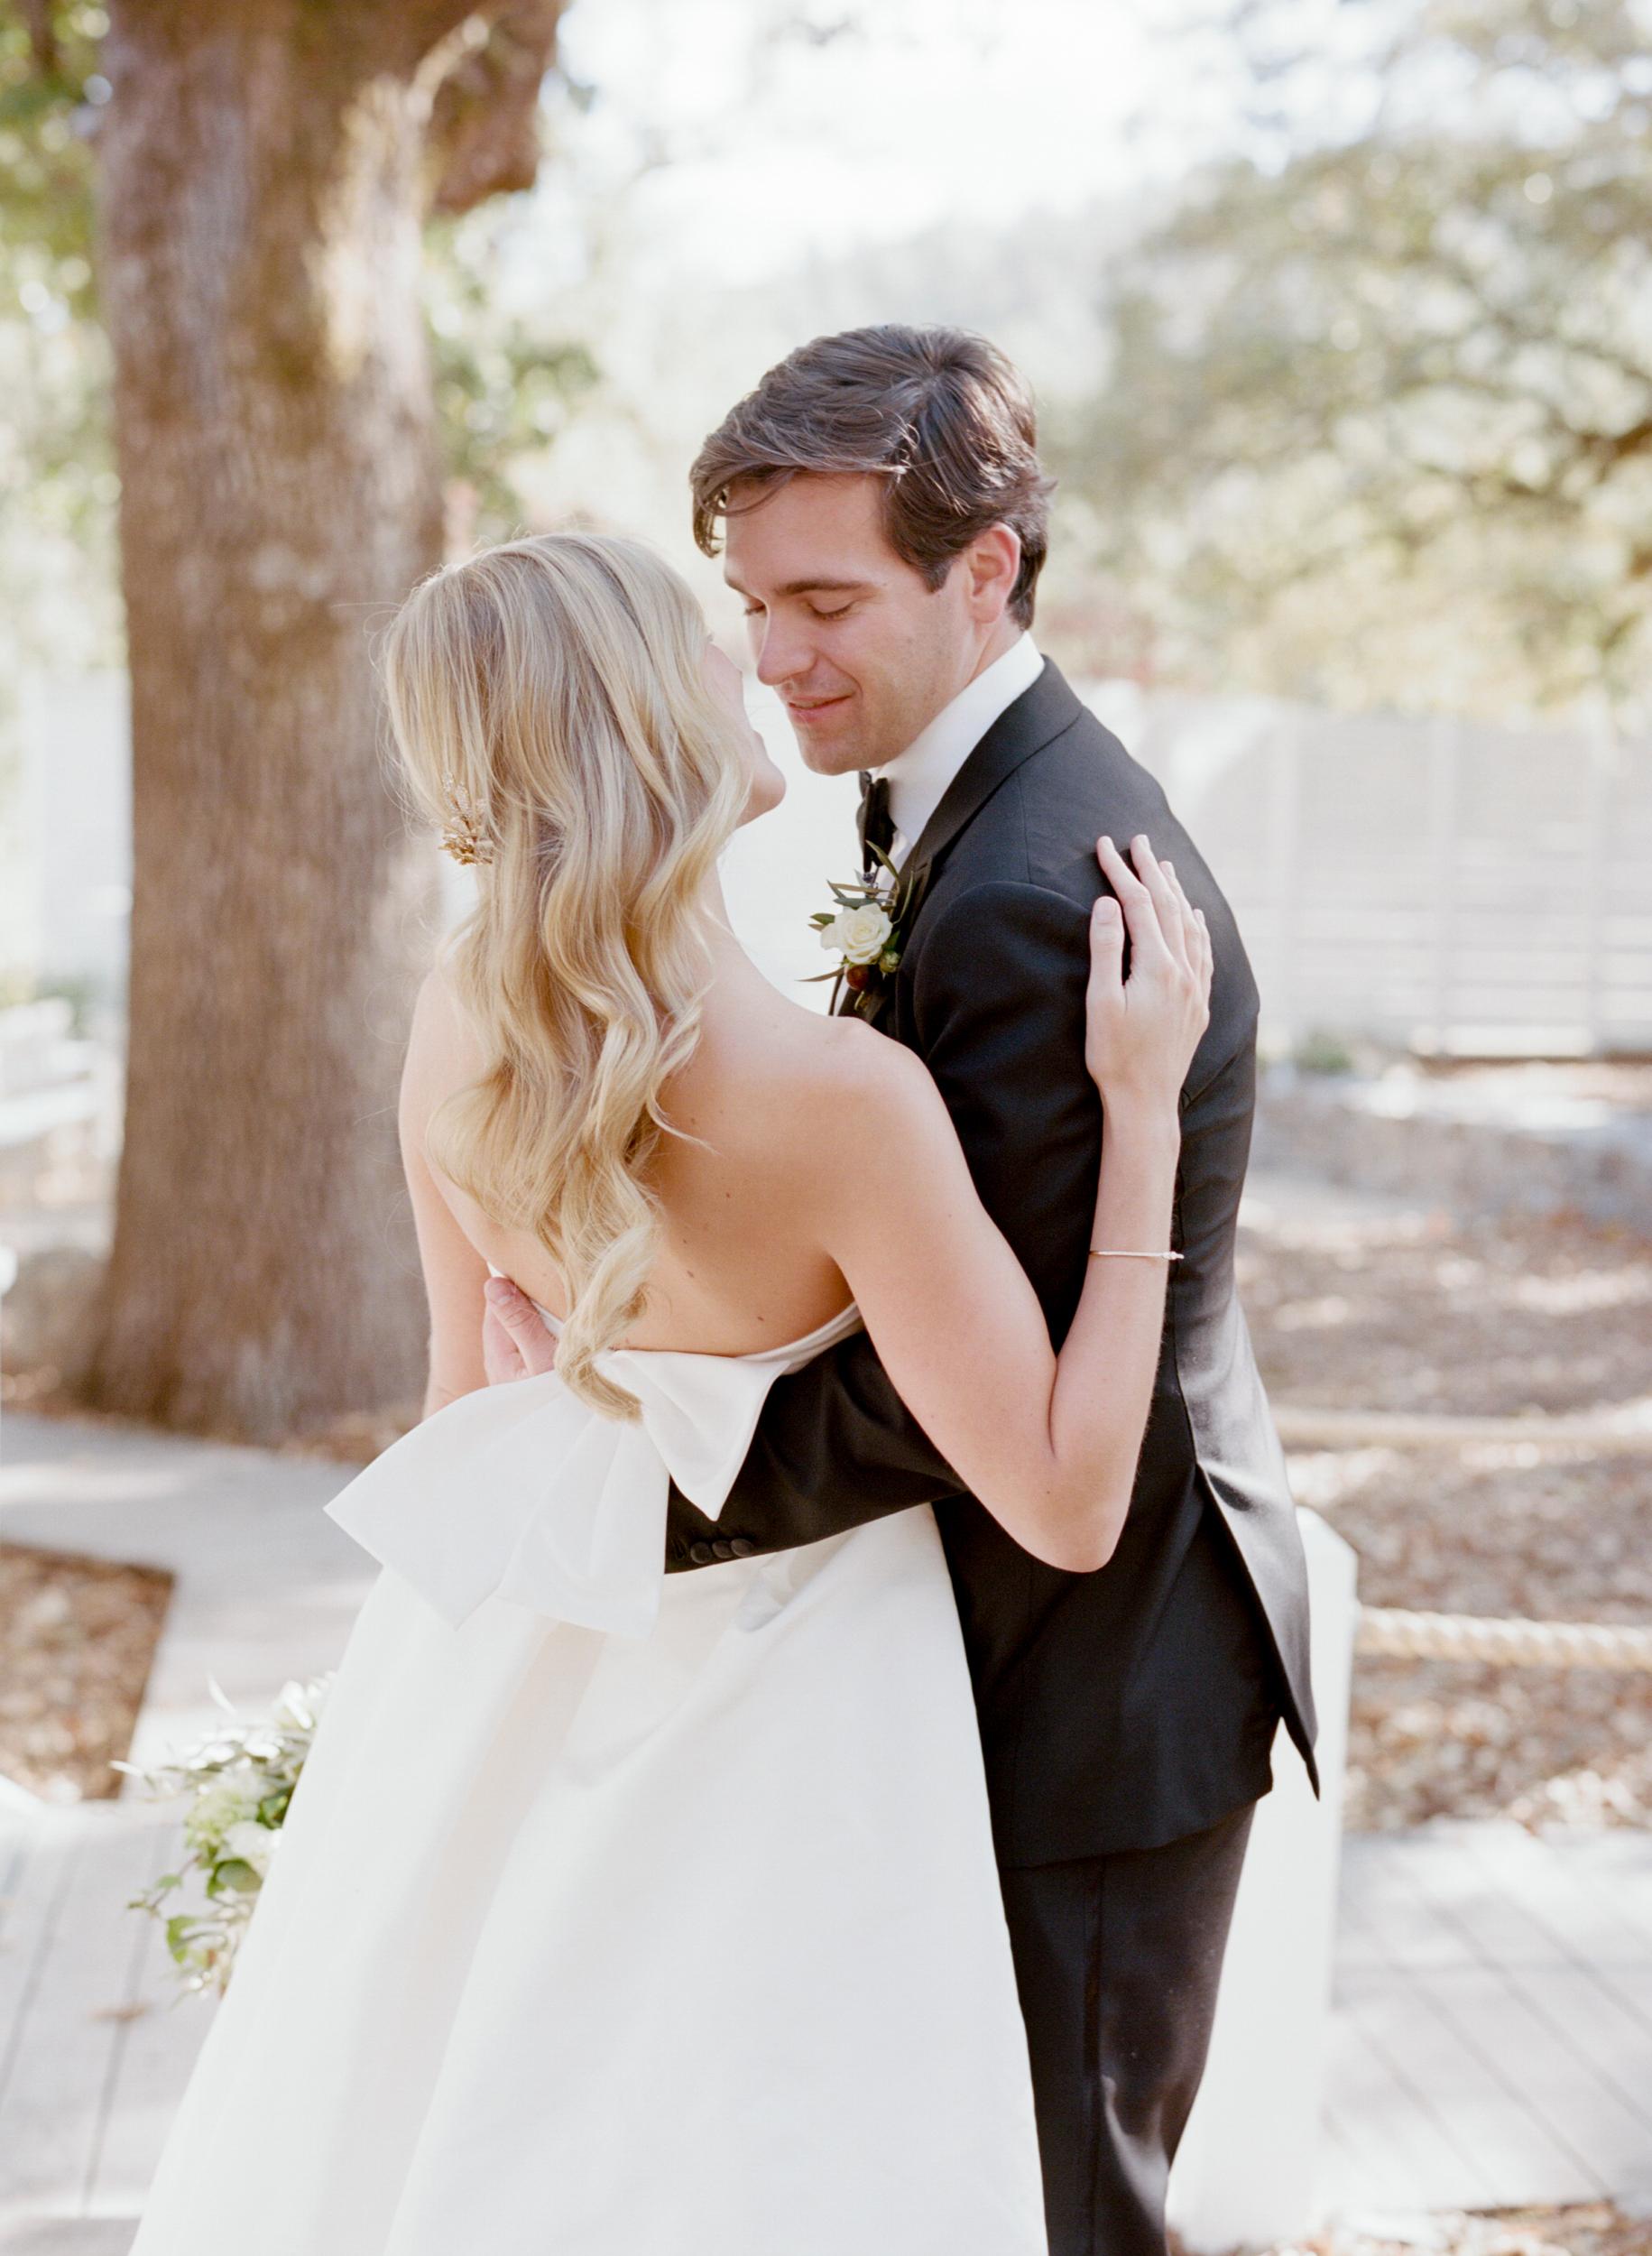 SylvieGil-Durham-Ranch-Organic-Ethereal-Rustic-Dress-Bow-KissWedding